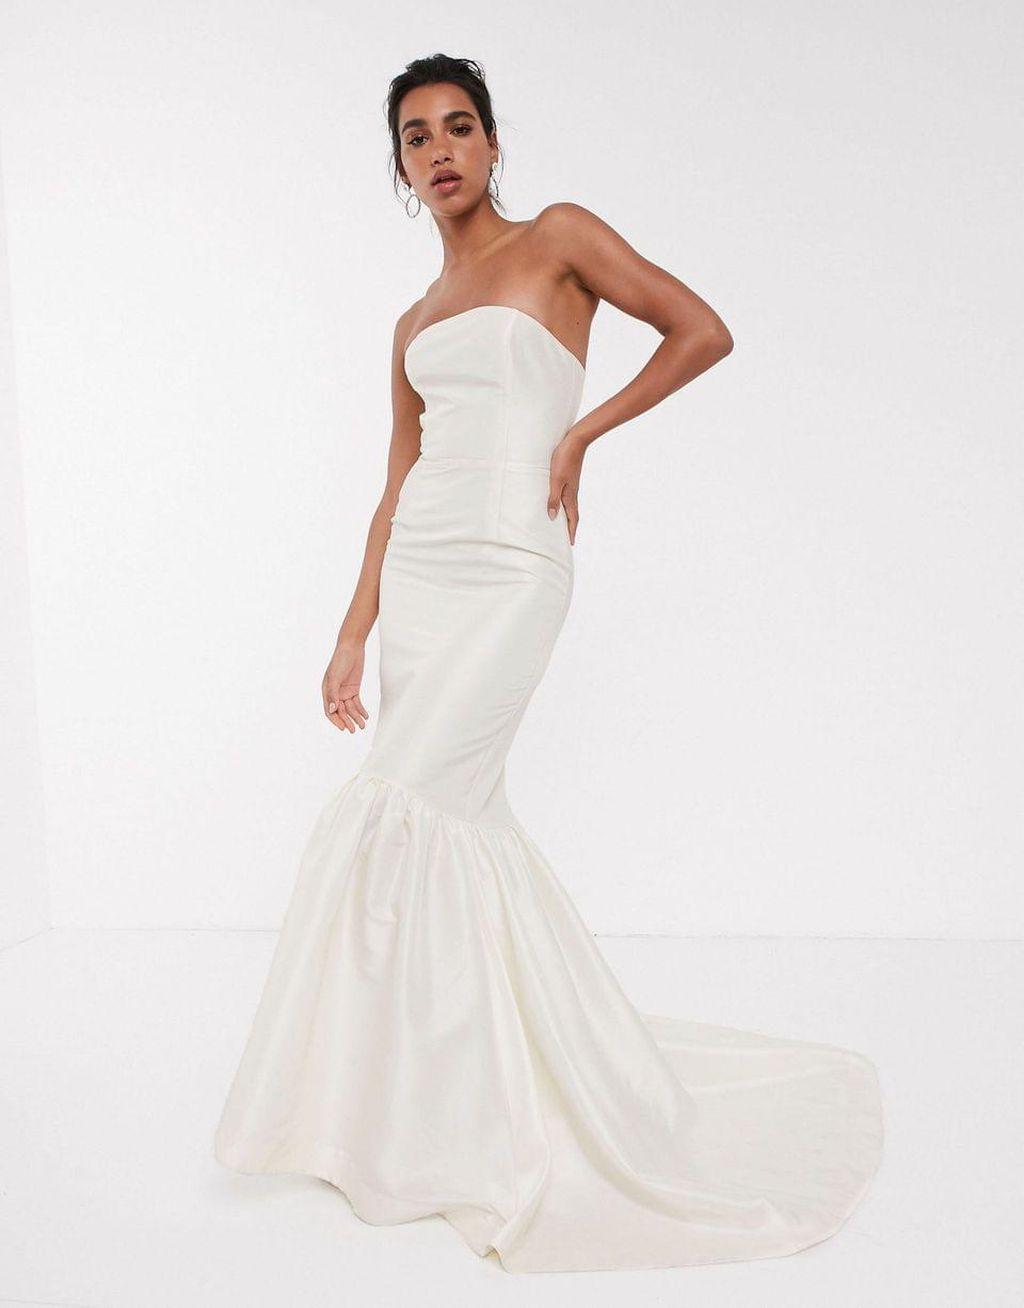 ASOS vjenčanica, 150 funti (1296,61 kn)